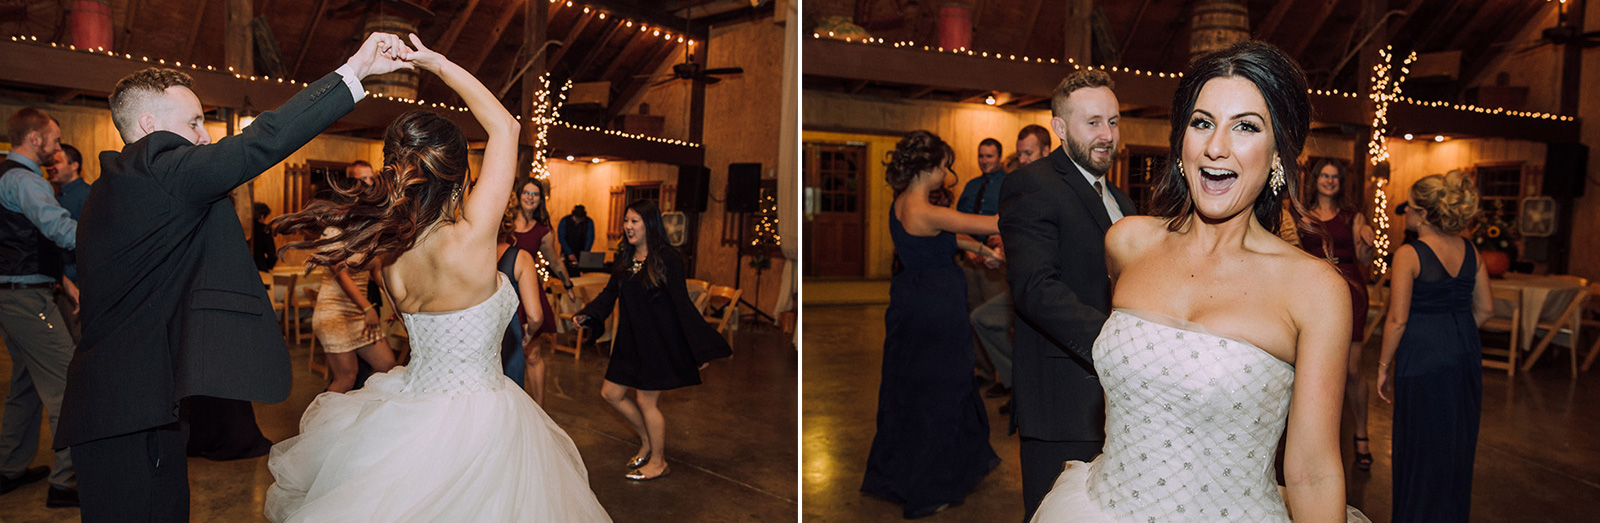 atlanta wedding photographers elopement photographer engagement photography hightower falls wedding venue_1040.jpg